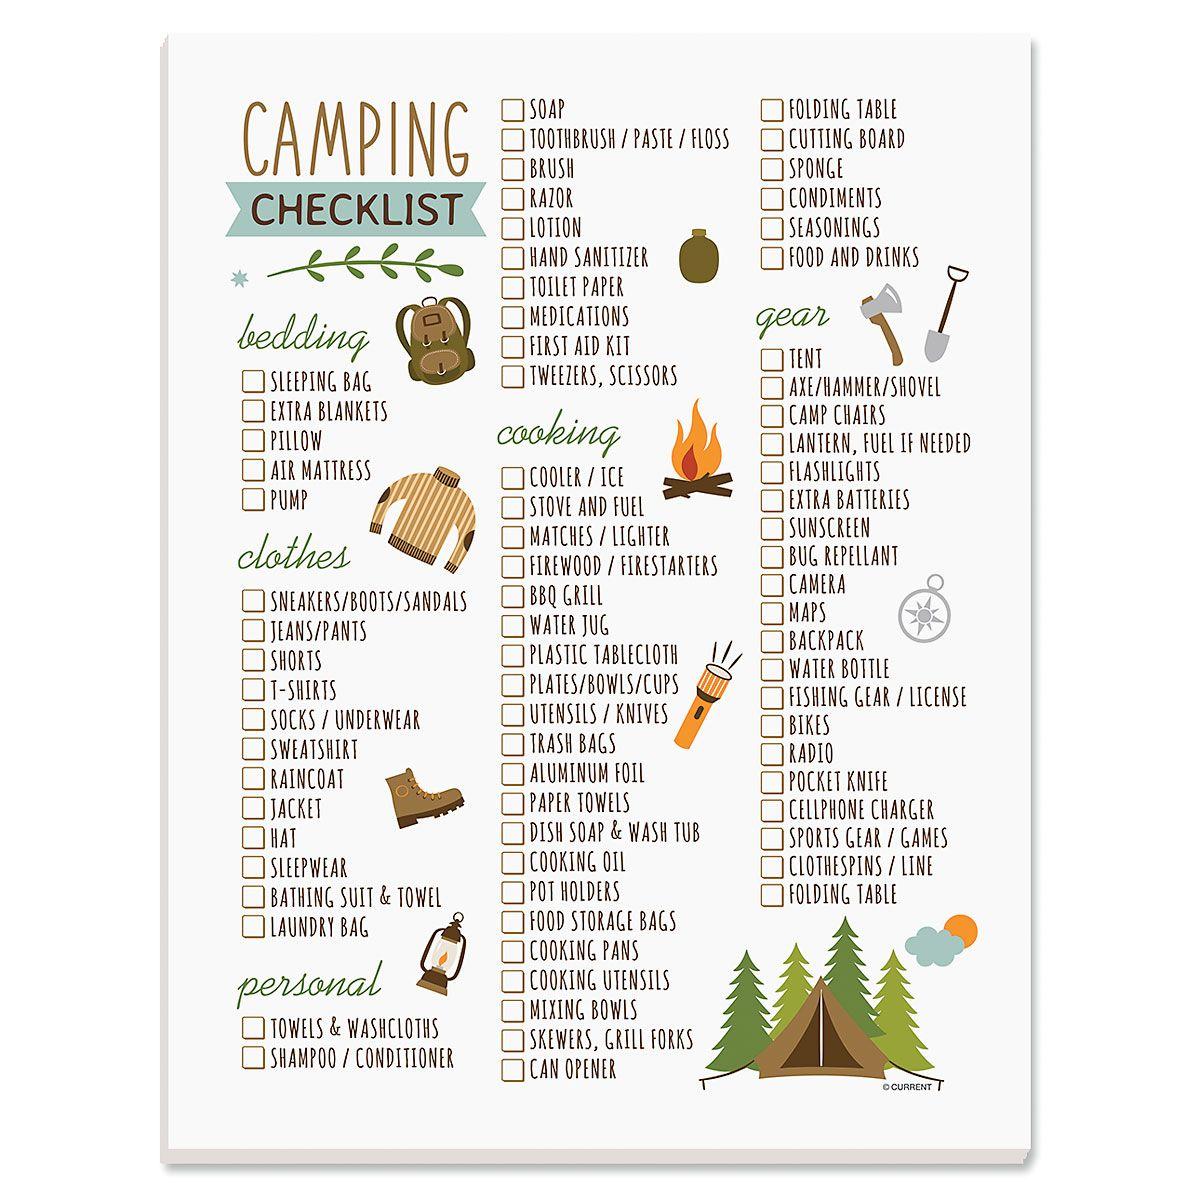 Camping Trip Packing Checklist Pad